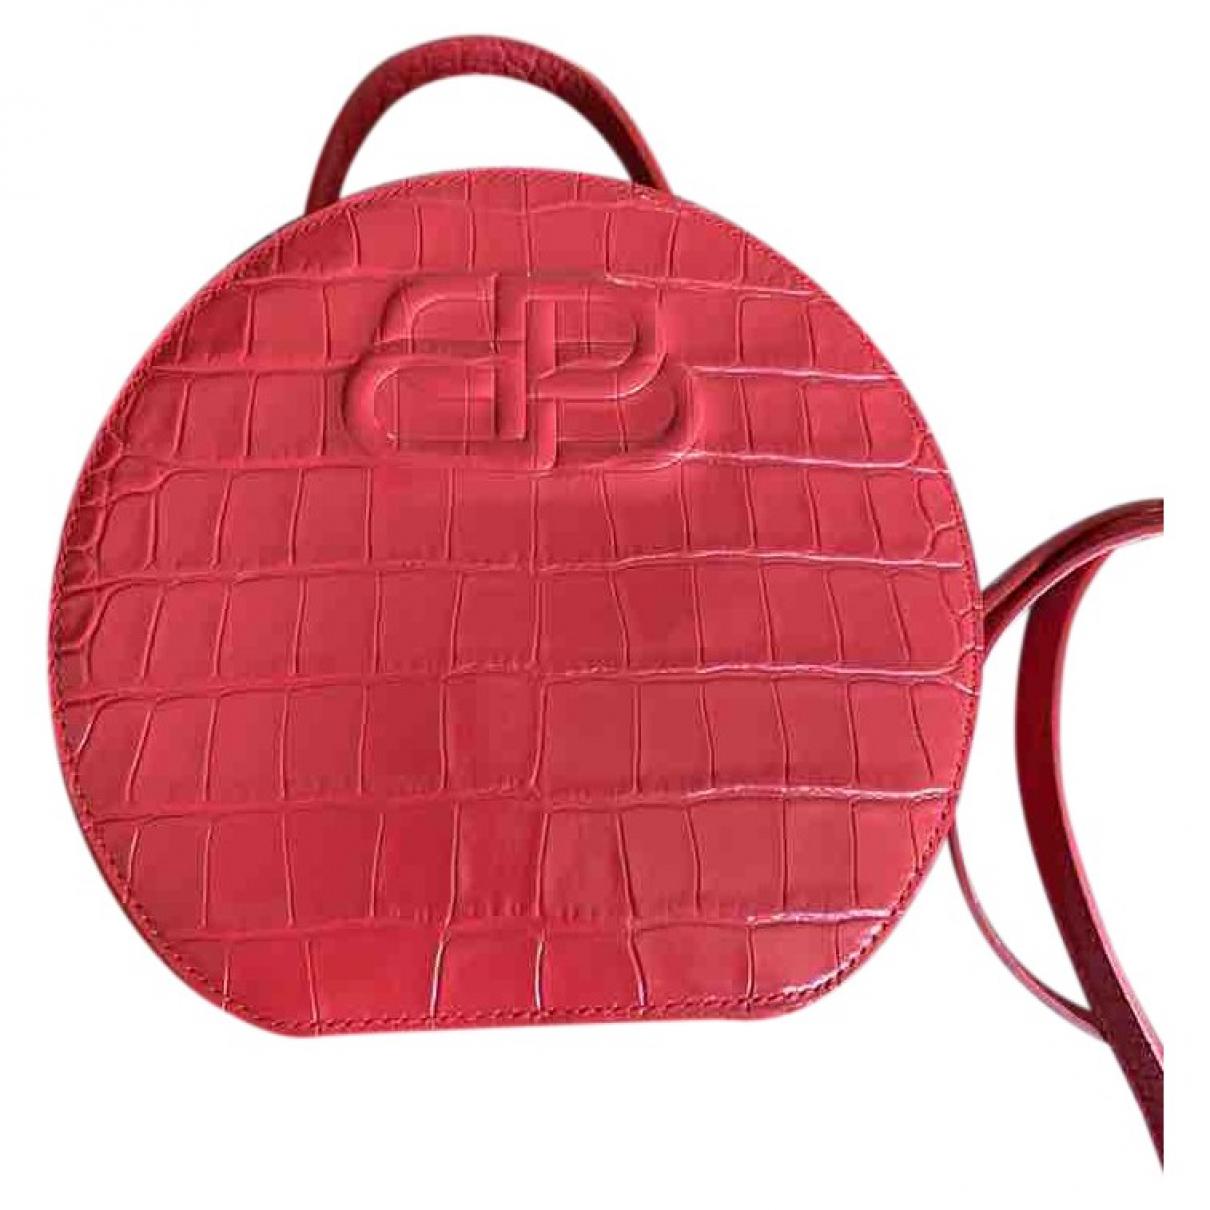 Balenciaga \N Handtasche in  Rot Leder